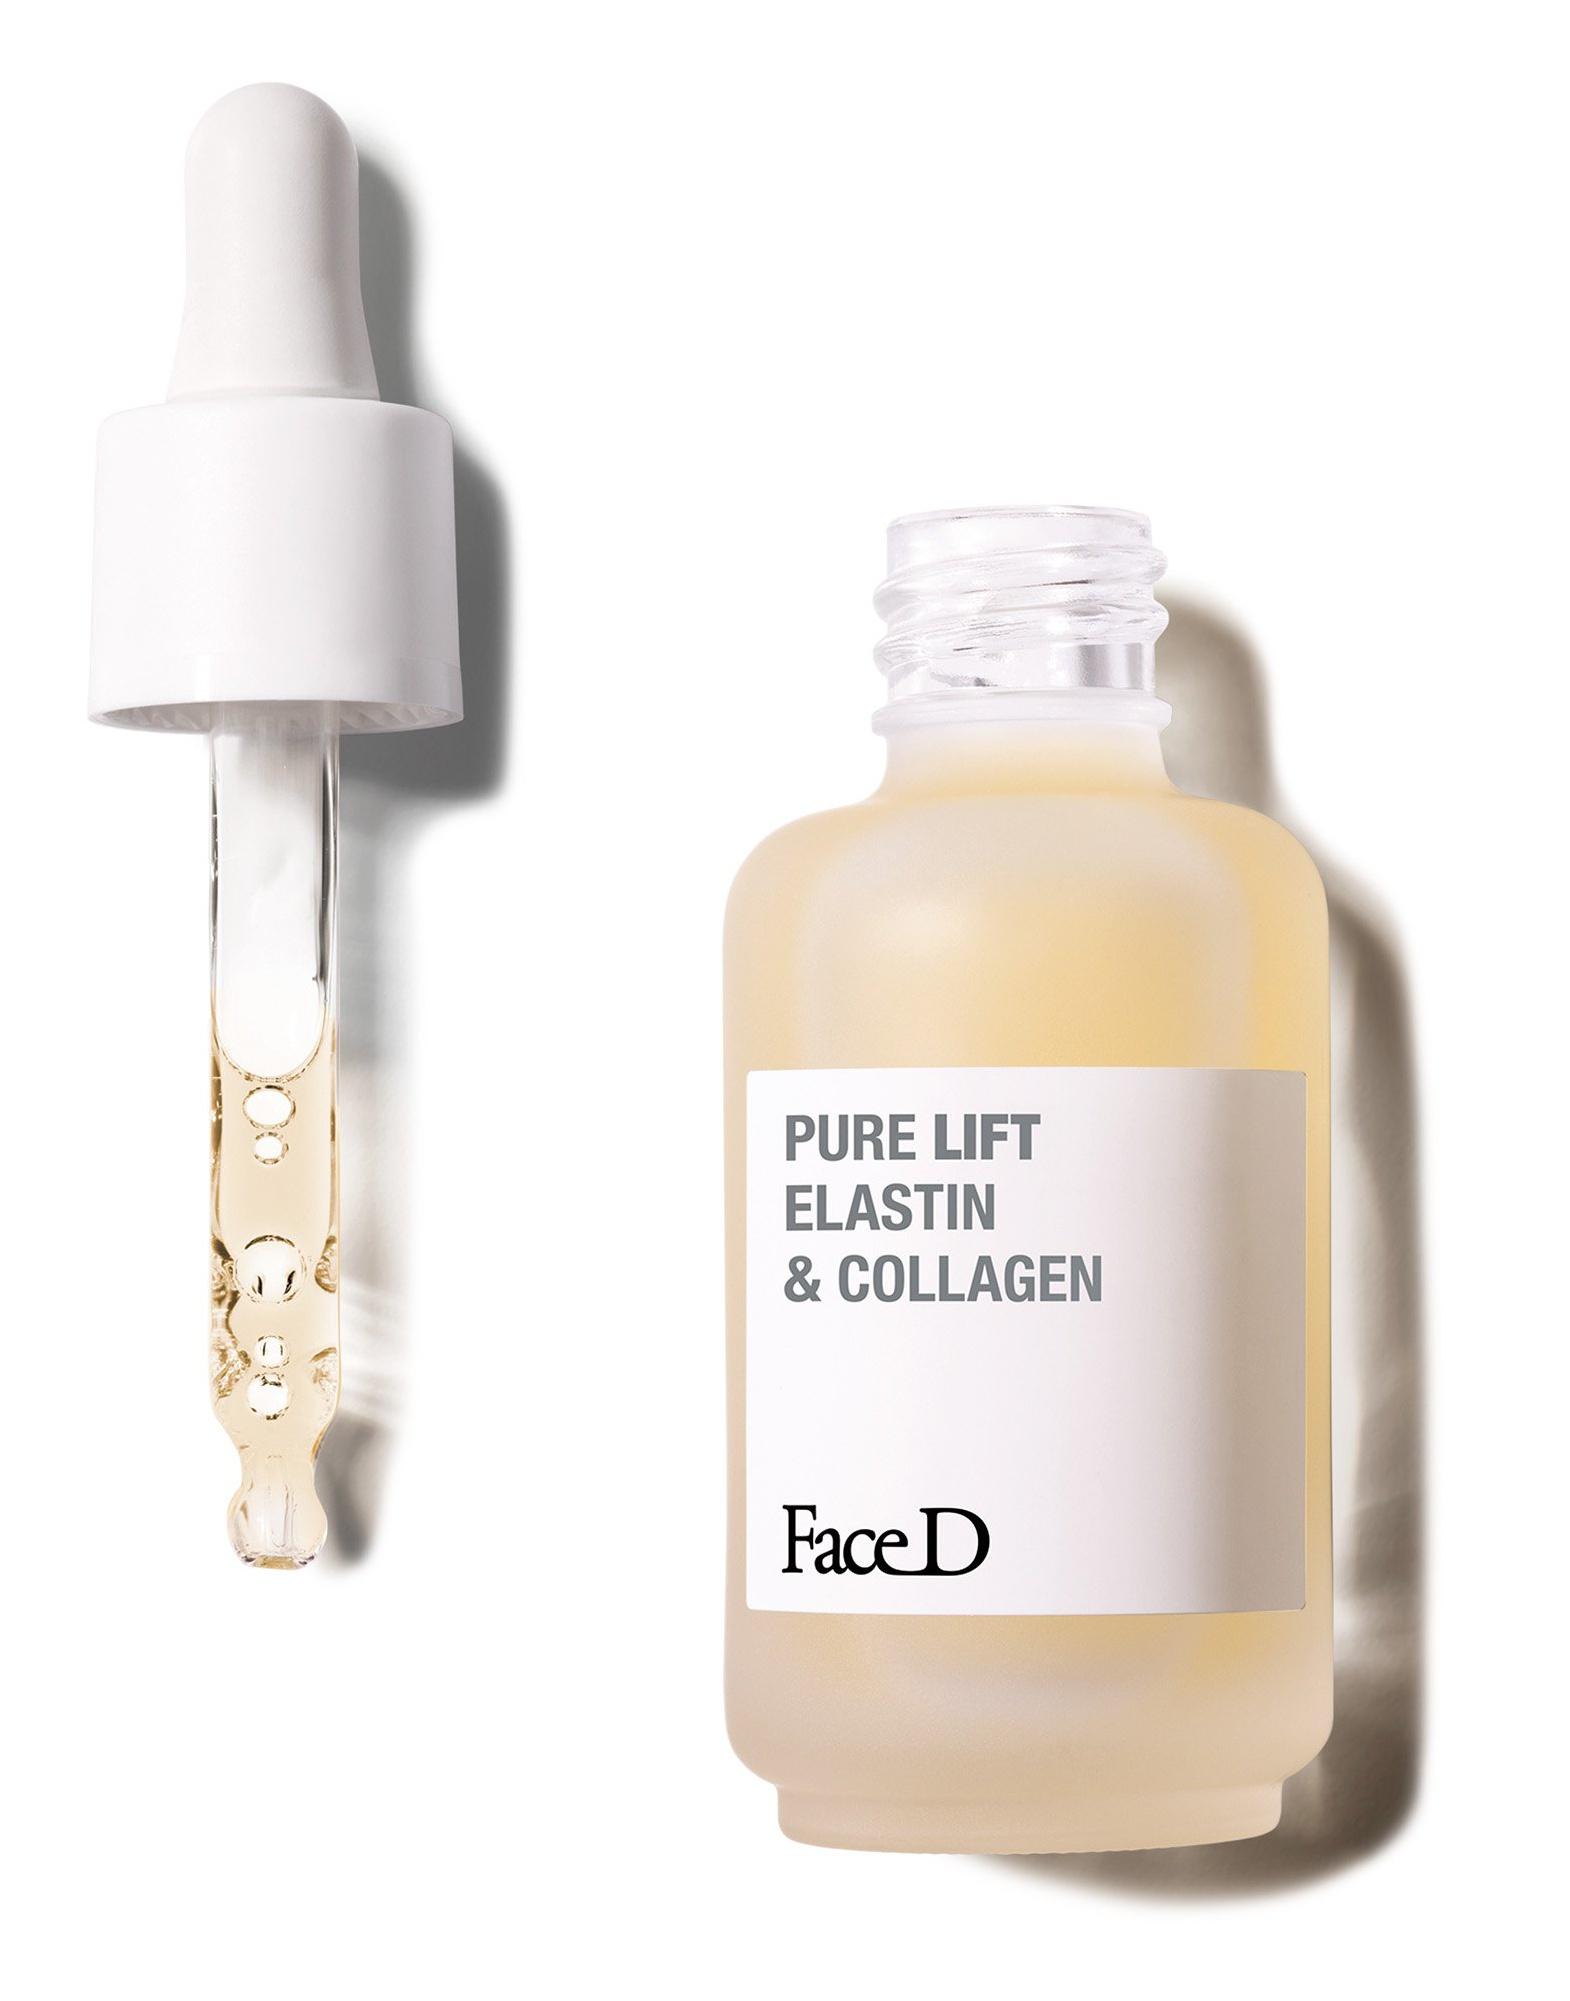 Face D Pure Lift Elastin & Collagen